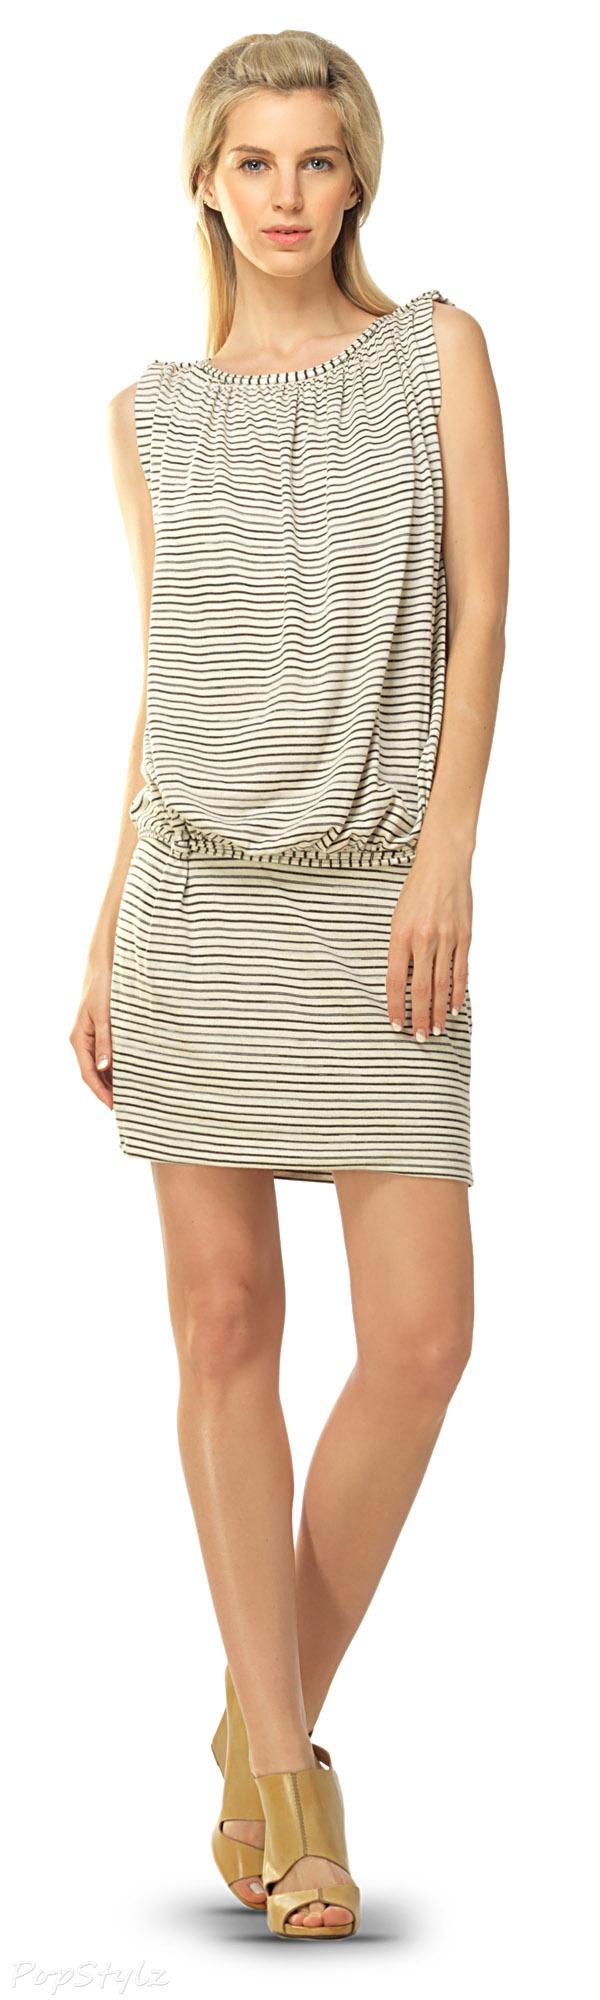 MAXSTUDIO Jersey Blouson Dress